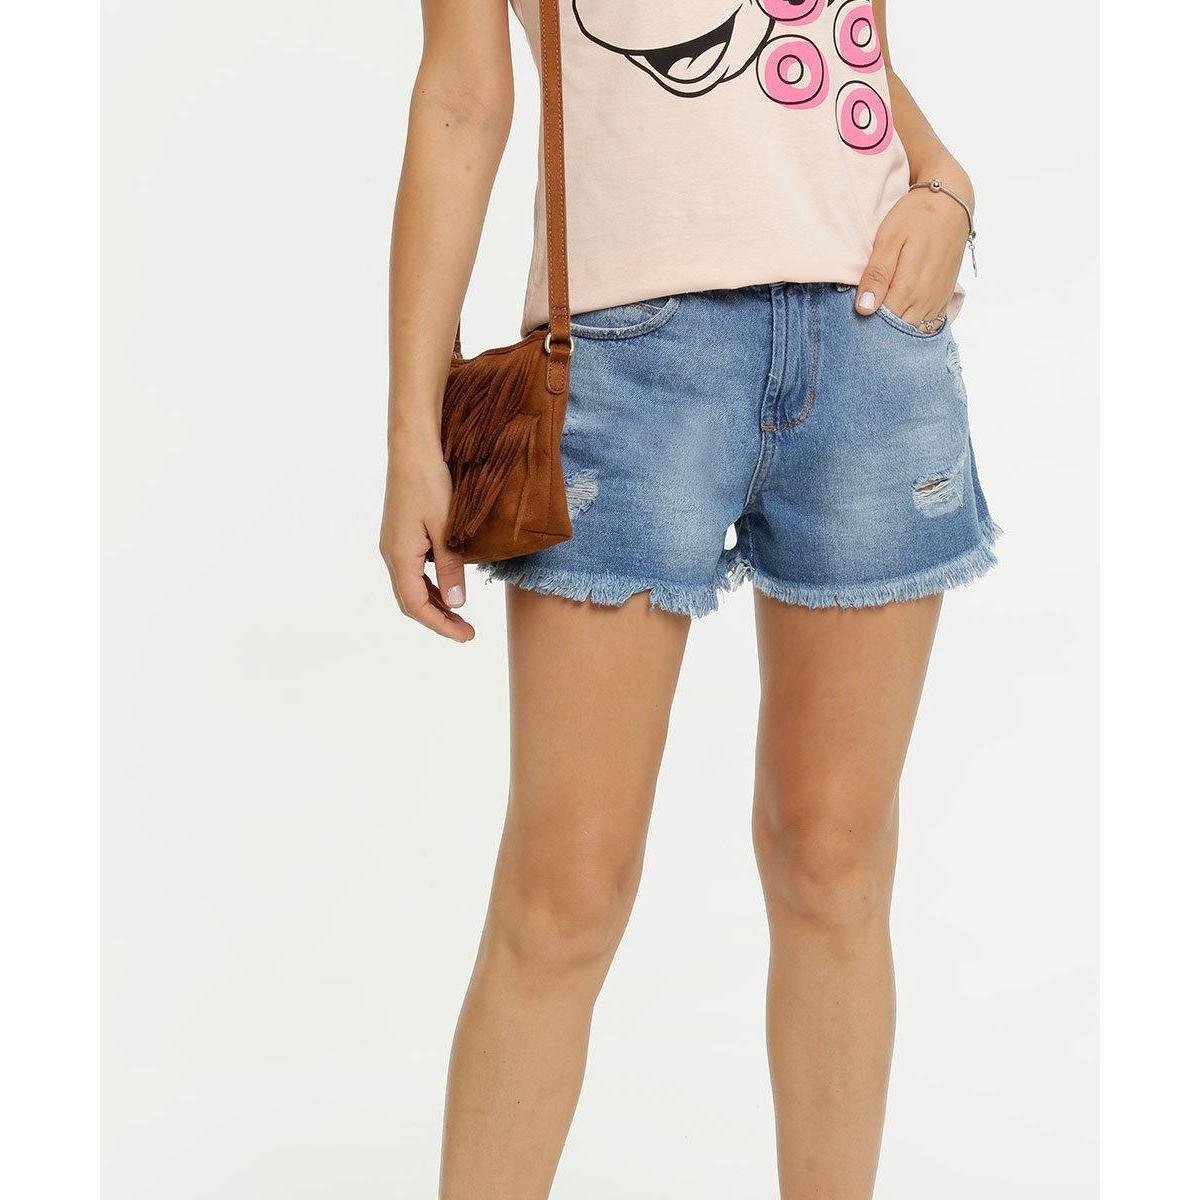 Short Jeans Destroyed Marisa - Feminino - Azul 9yY95las